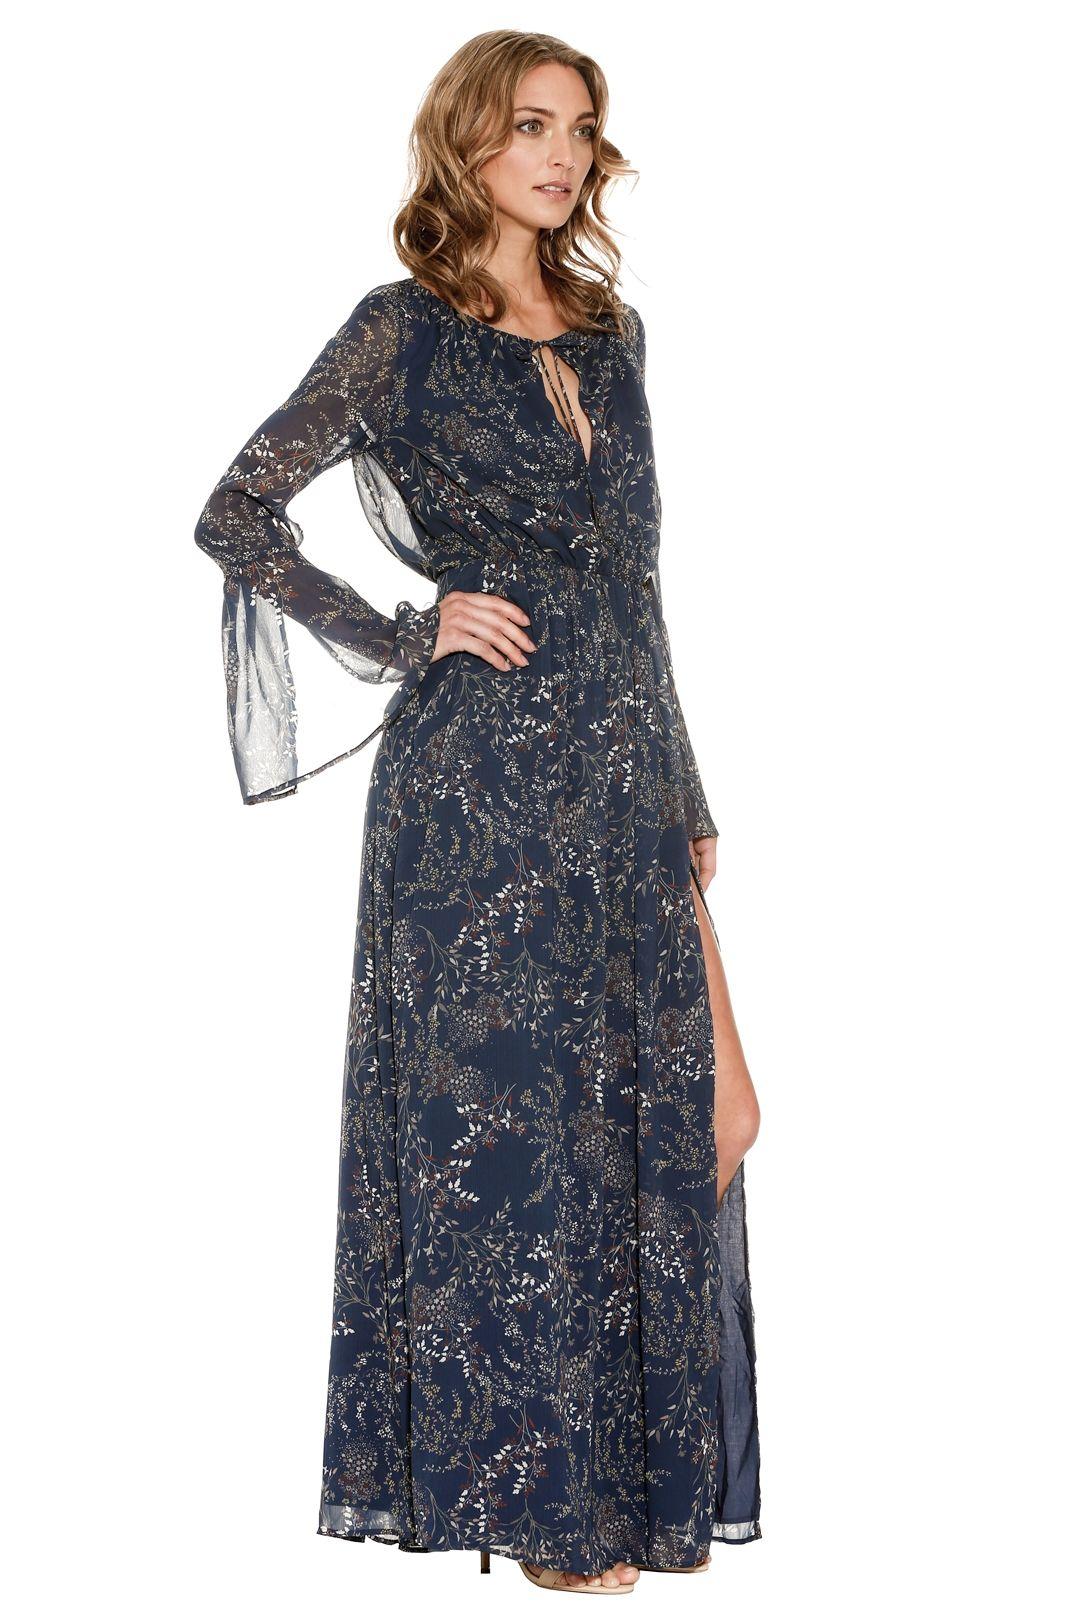 The Jetset Diaries - Mediterranean Maxi Dress - Blue - Side